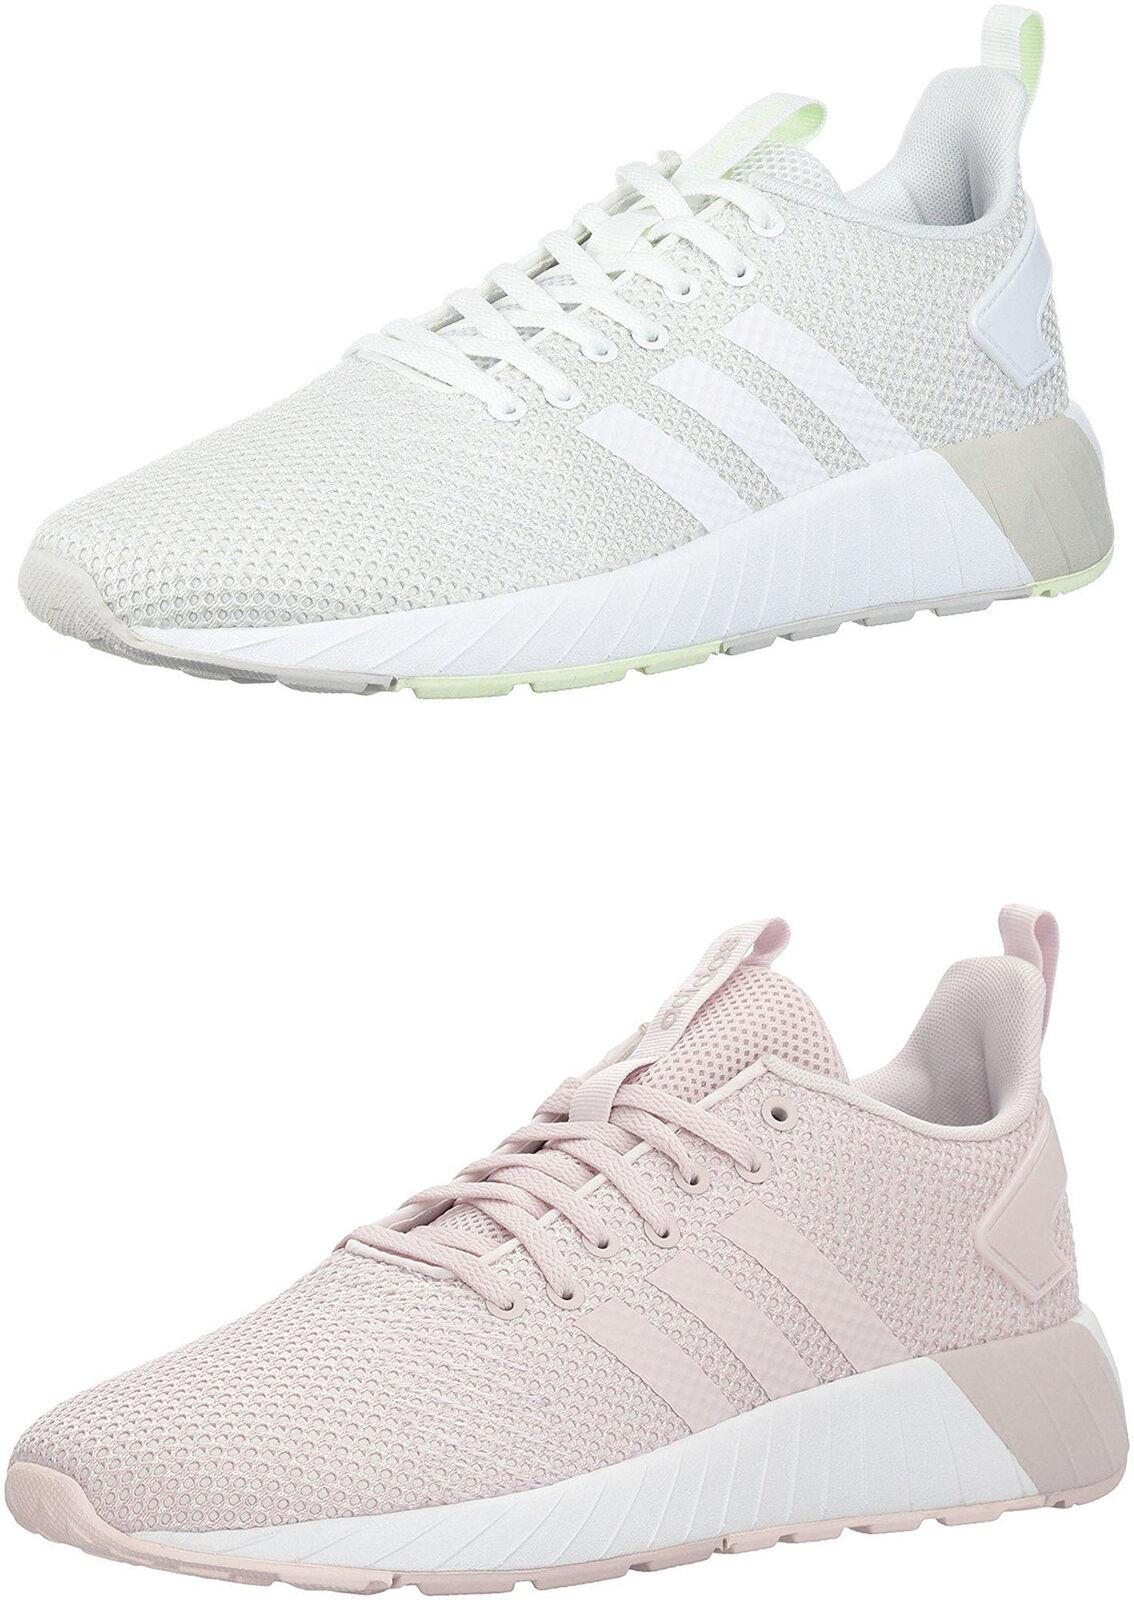 adidas  's questar questar 's byd chaussures, 2 couleurs e50d28